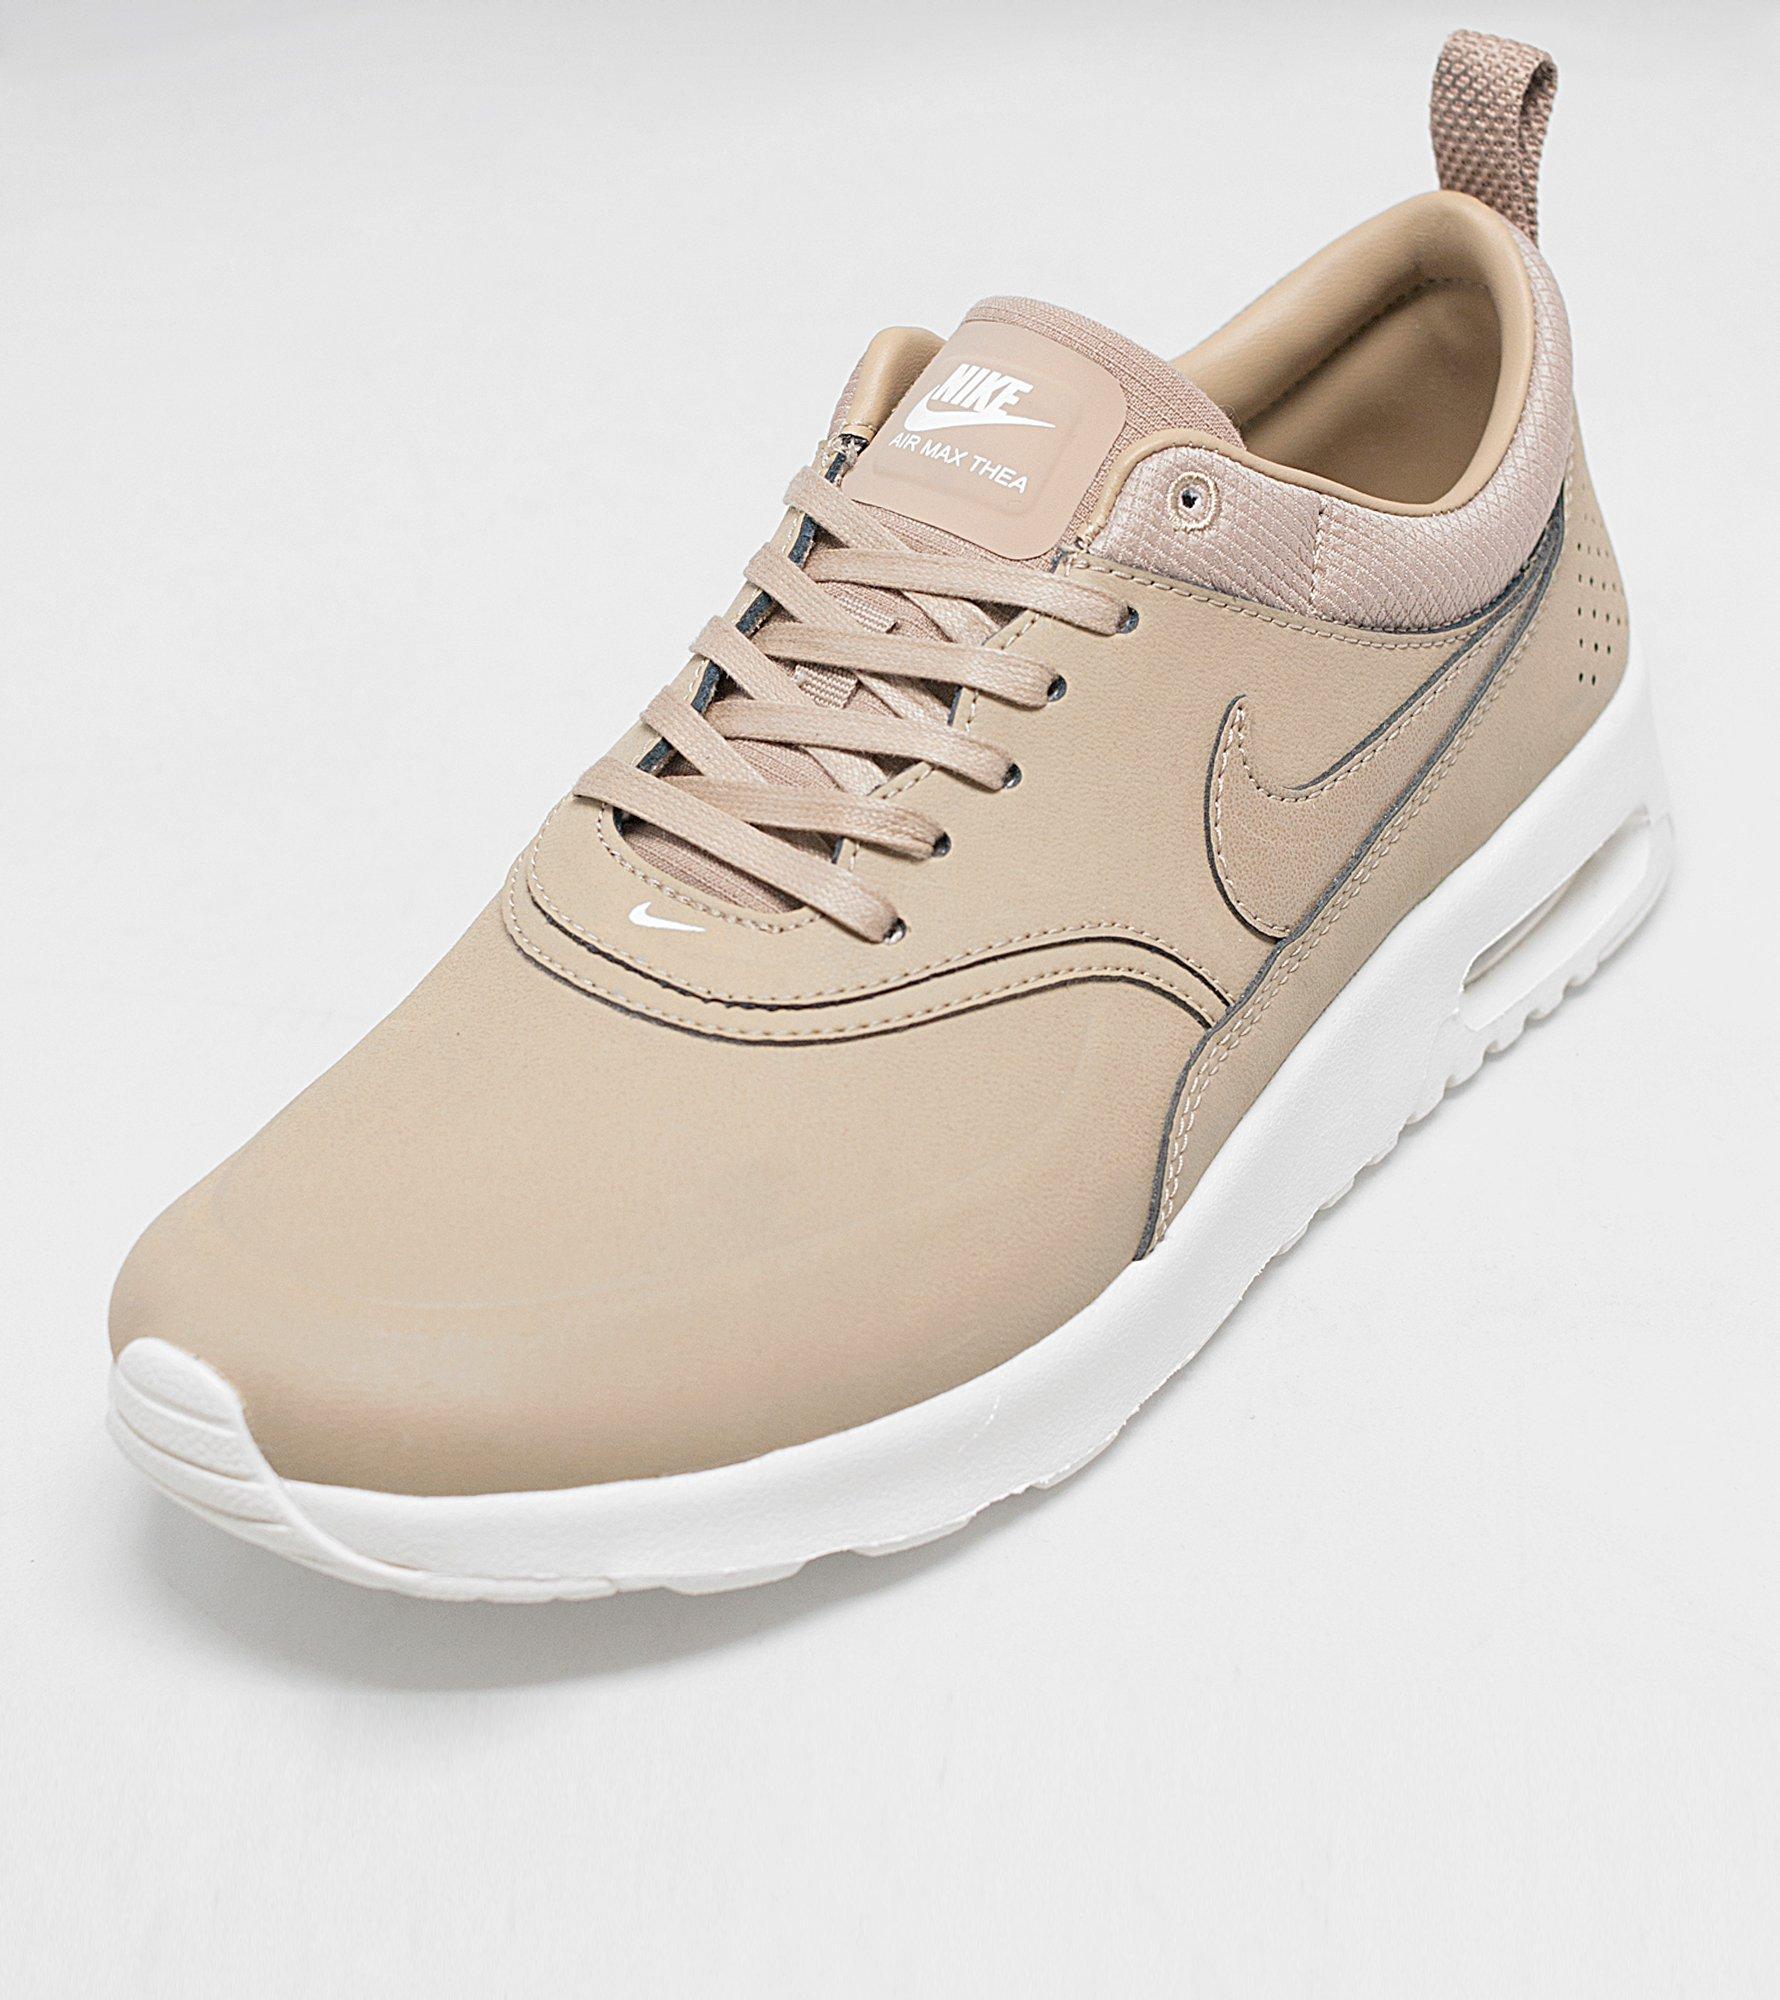 Nike Air Max Thea Beige niksilverprezzo.it